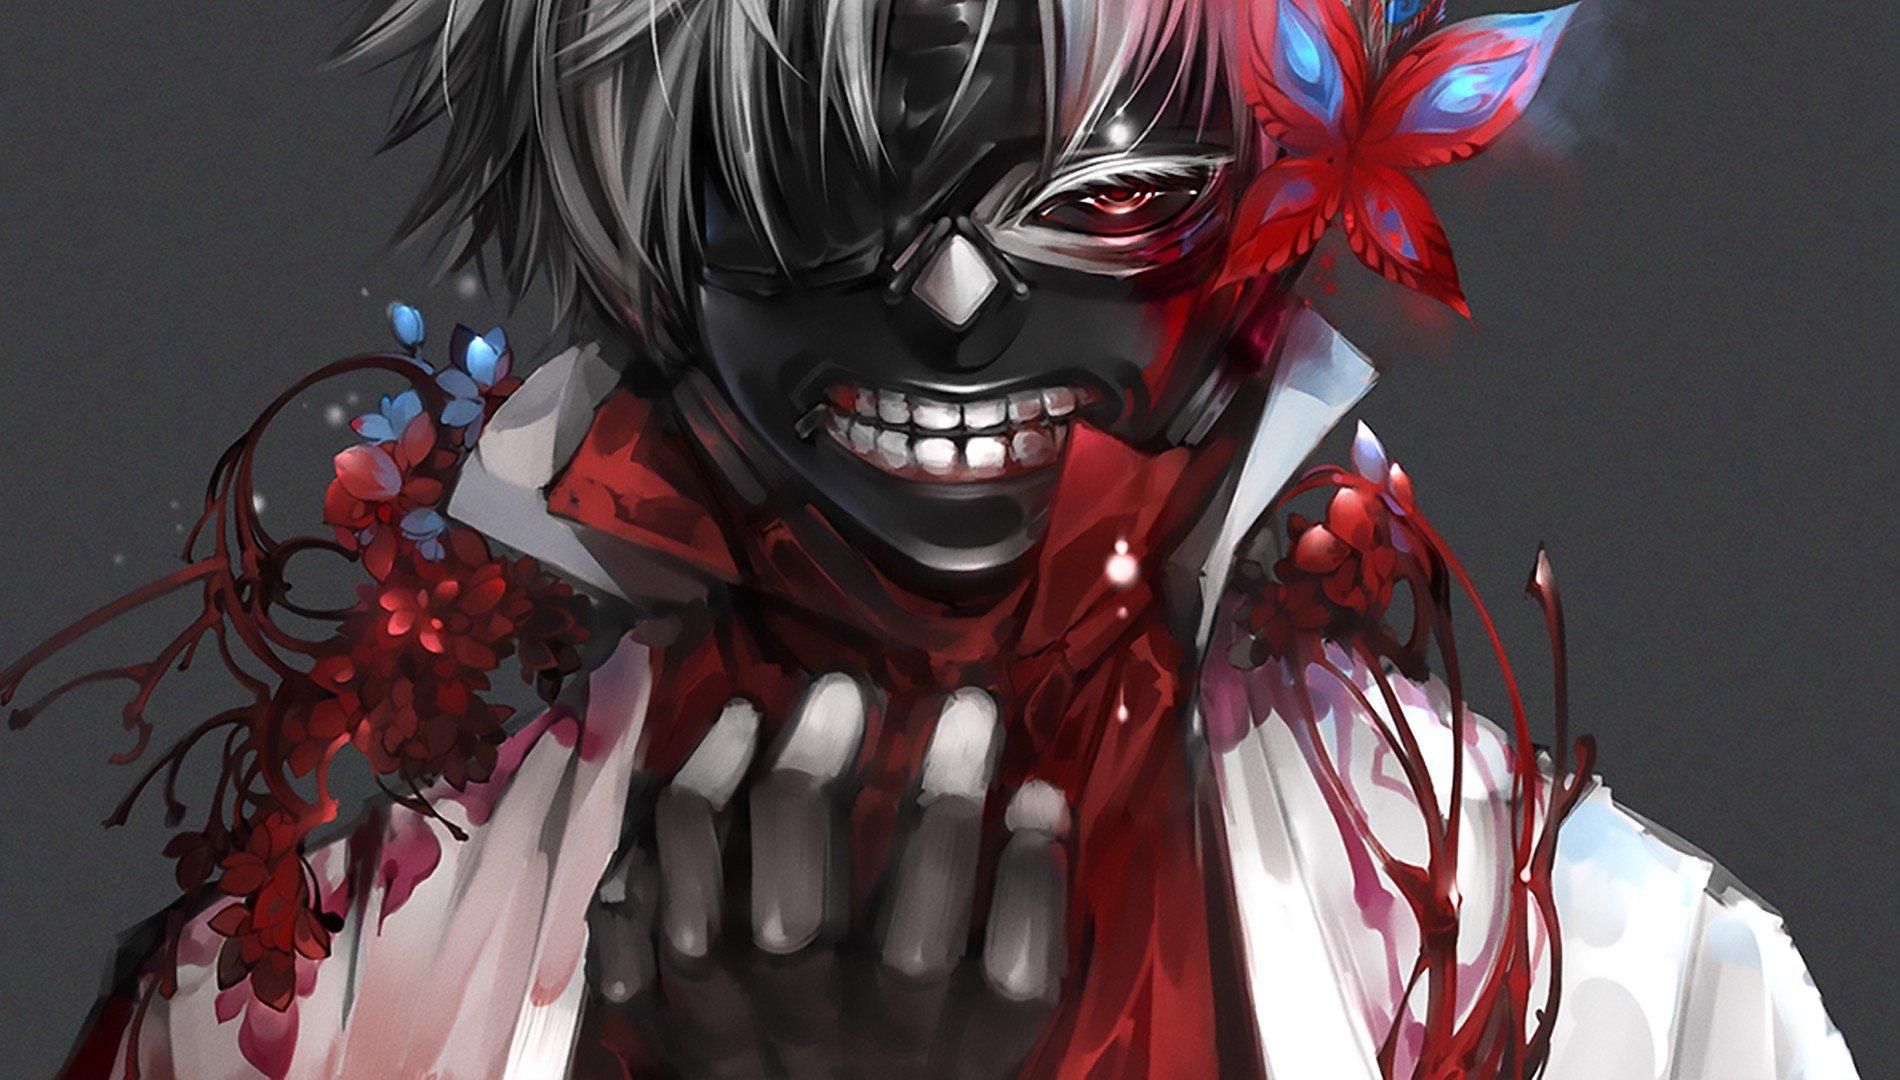 Wallpaper 1900x1080 Px Kaneki Ken Tokyo Ghoul 1900x1080